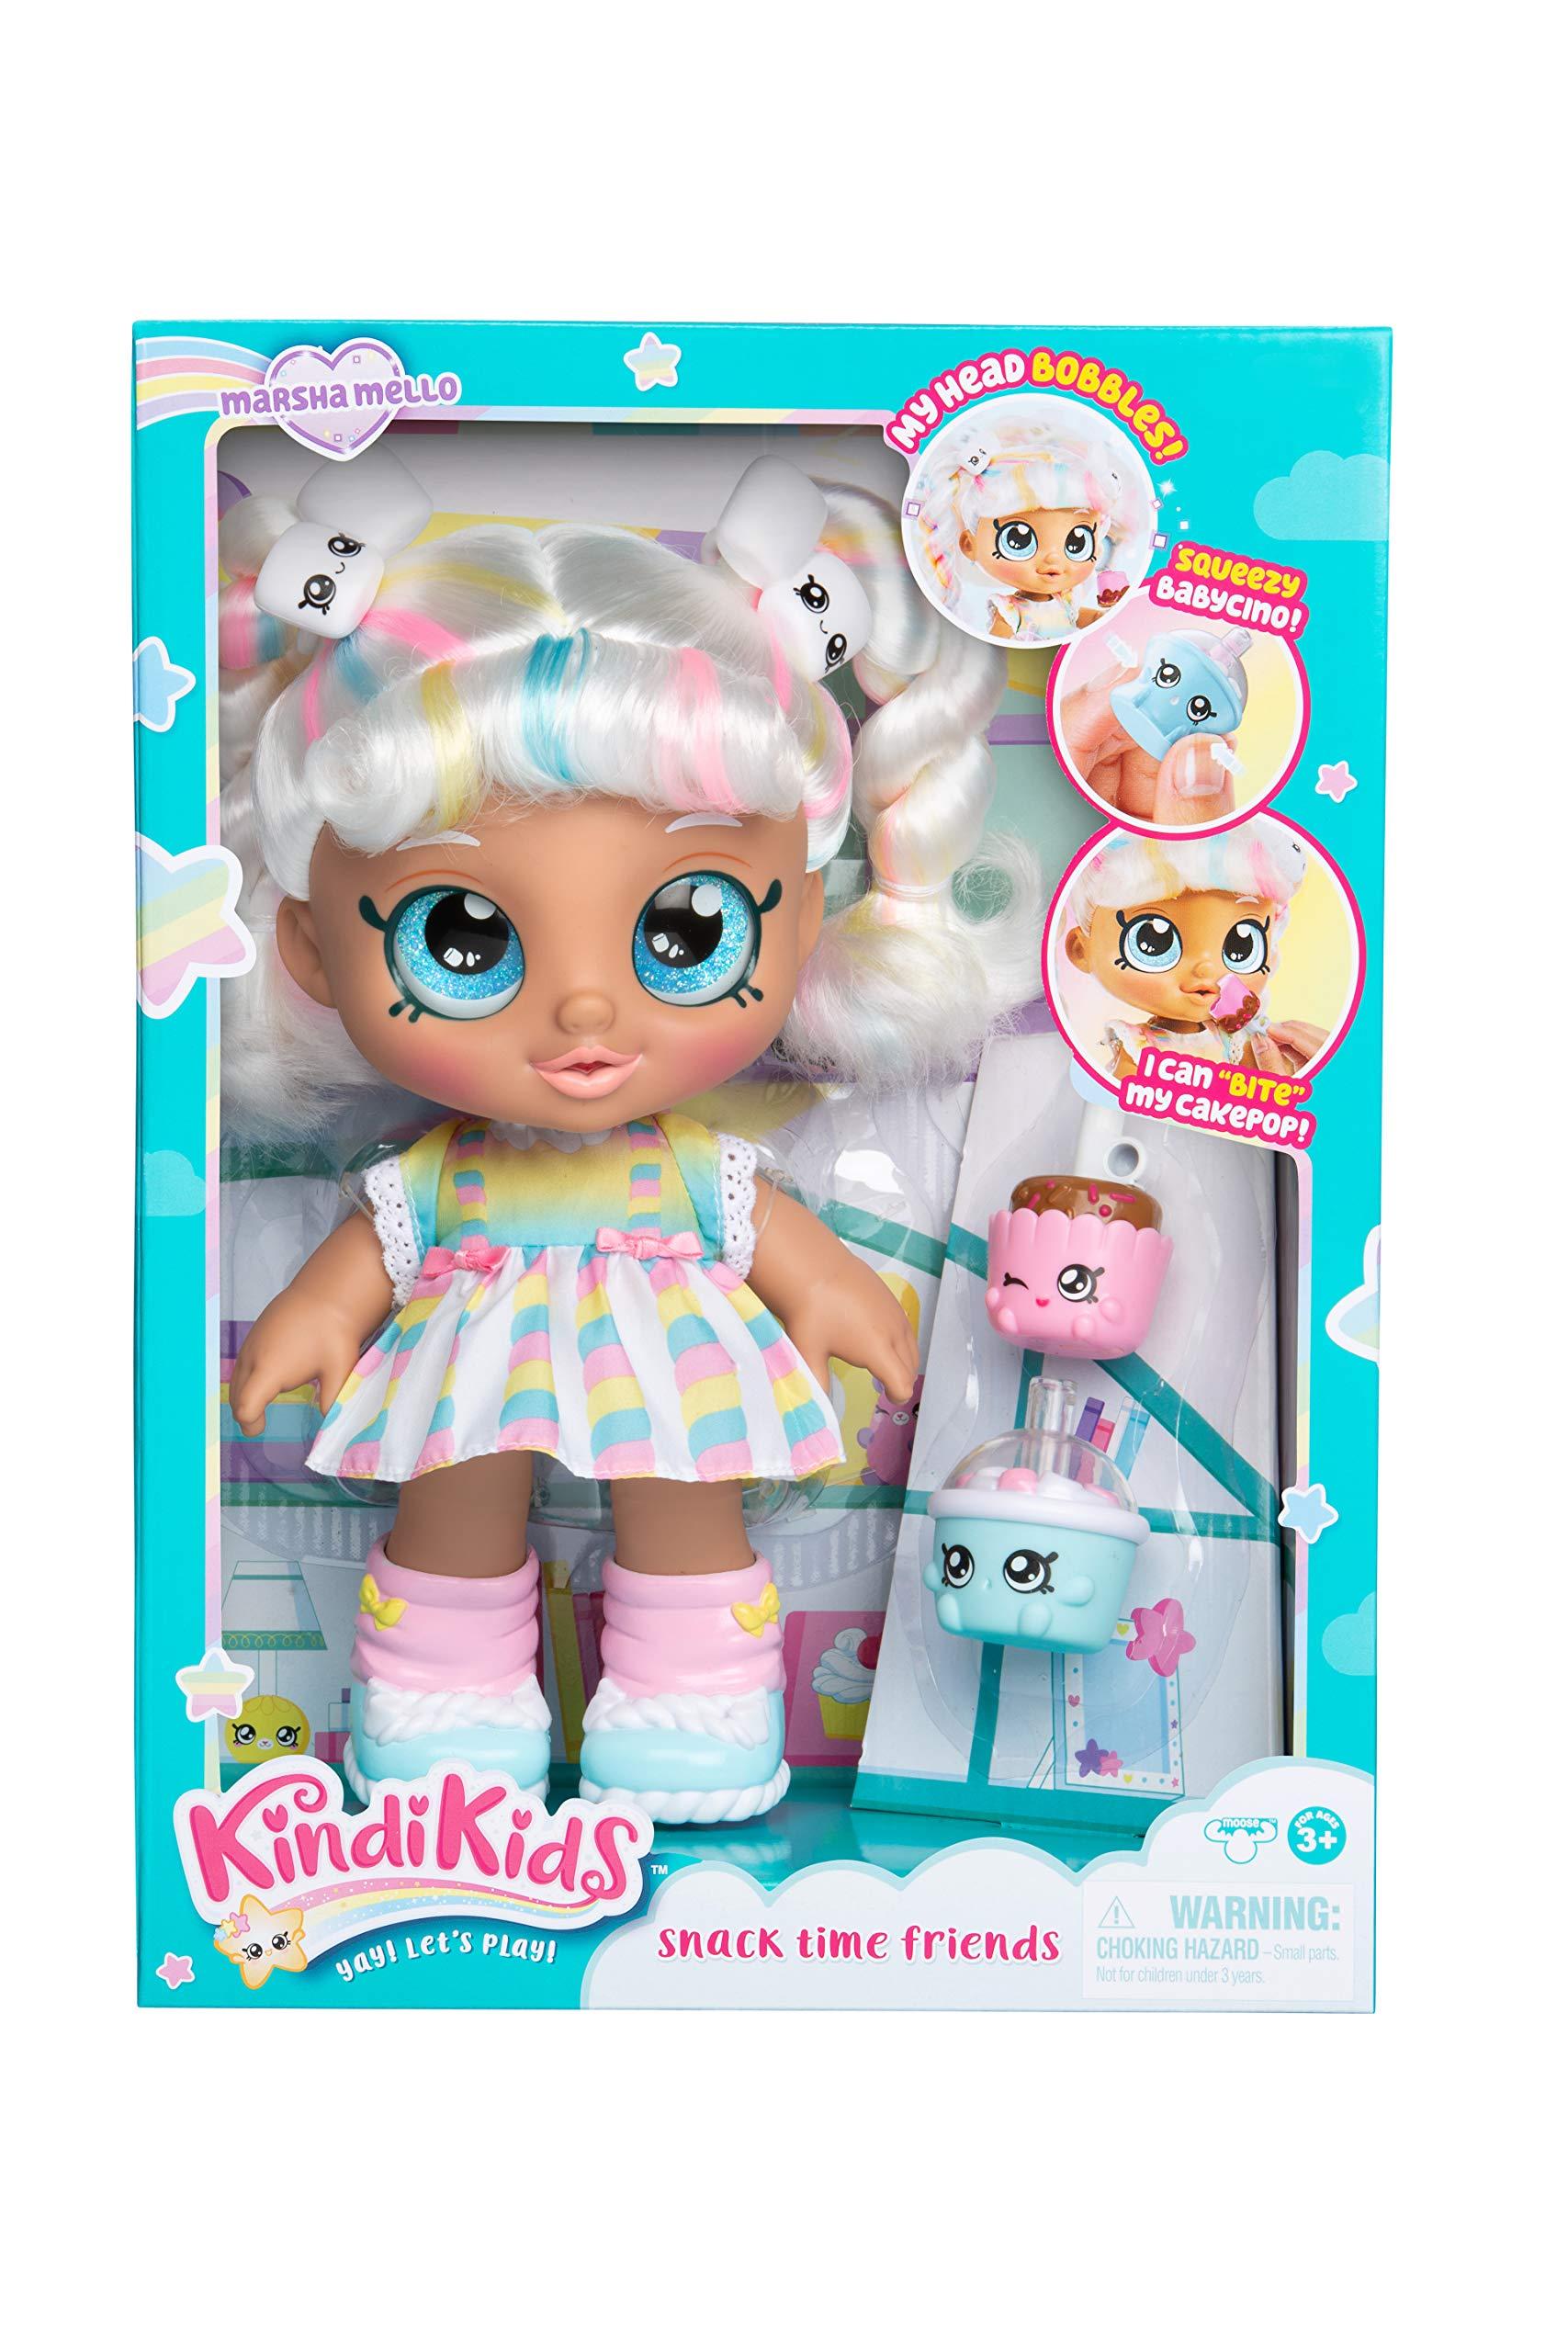 Kindi Kids Snack Time Friends, Pre-School 10'' Doll - Marsha Mello by Kindi Kids